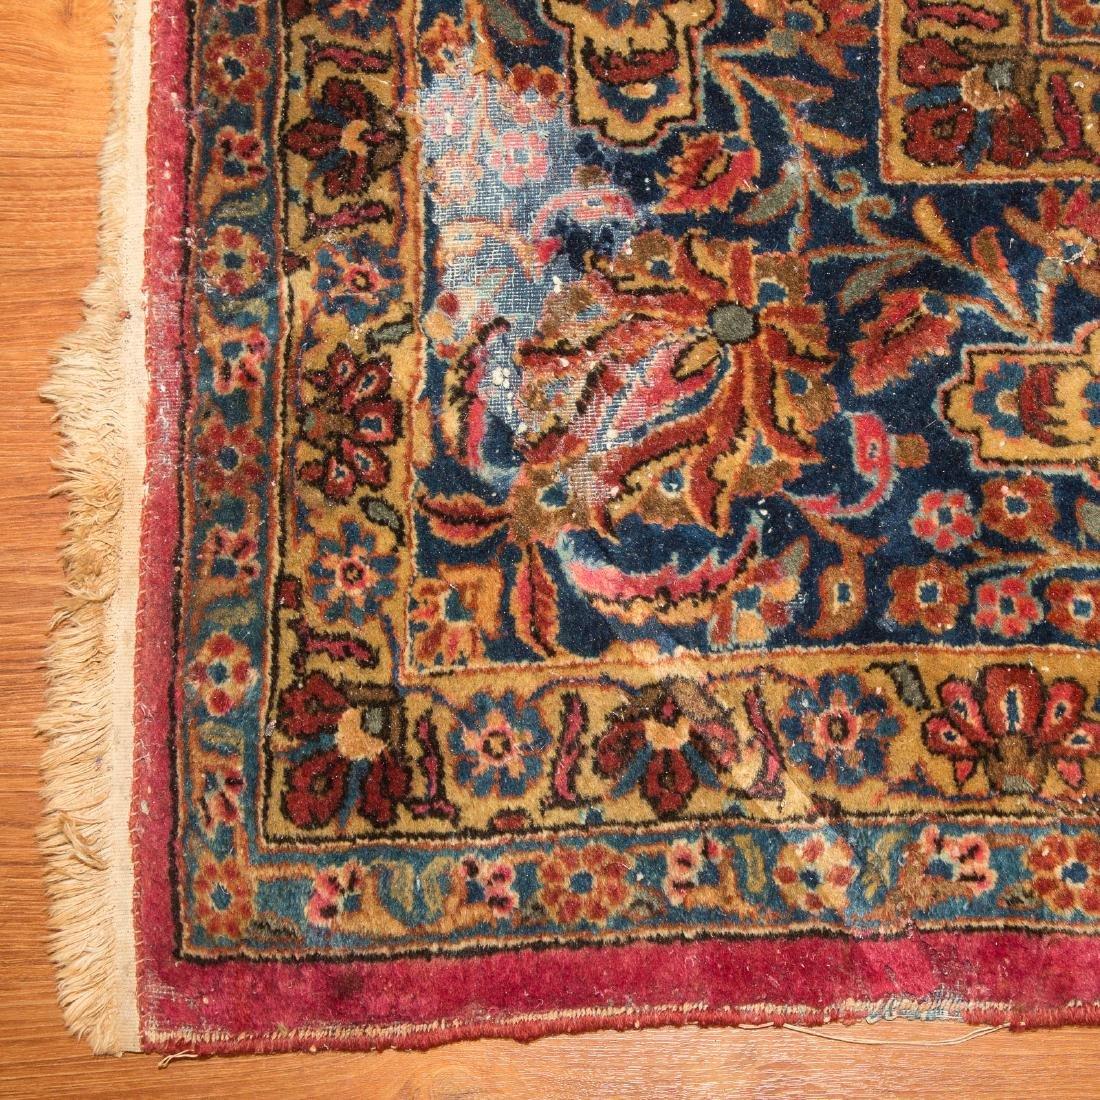 Antique Keshan carpet, approx. 8.9 x 11.11 - 2